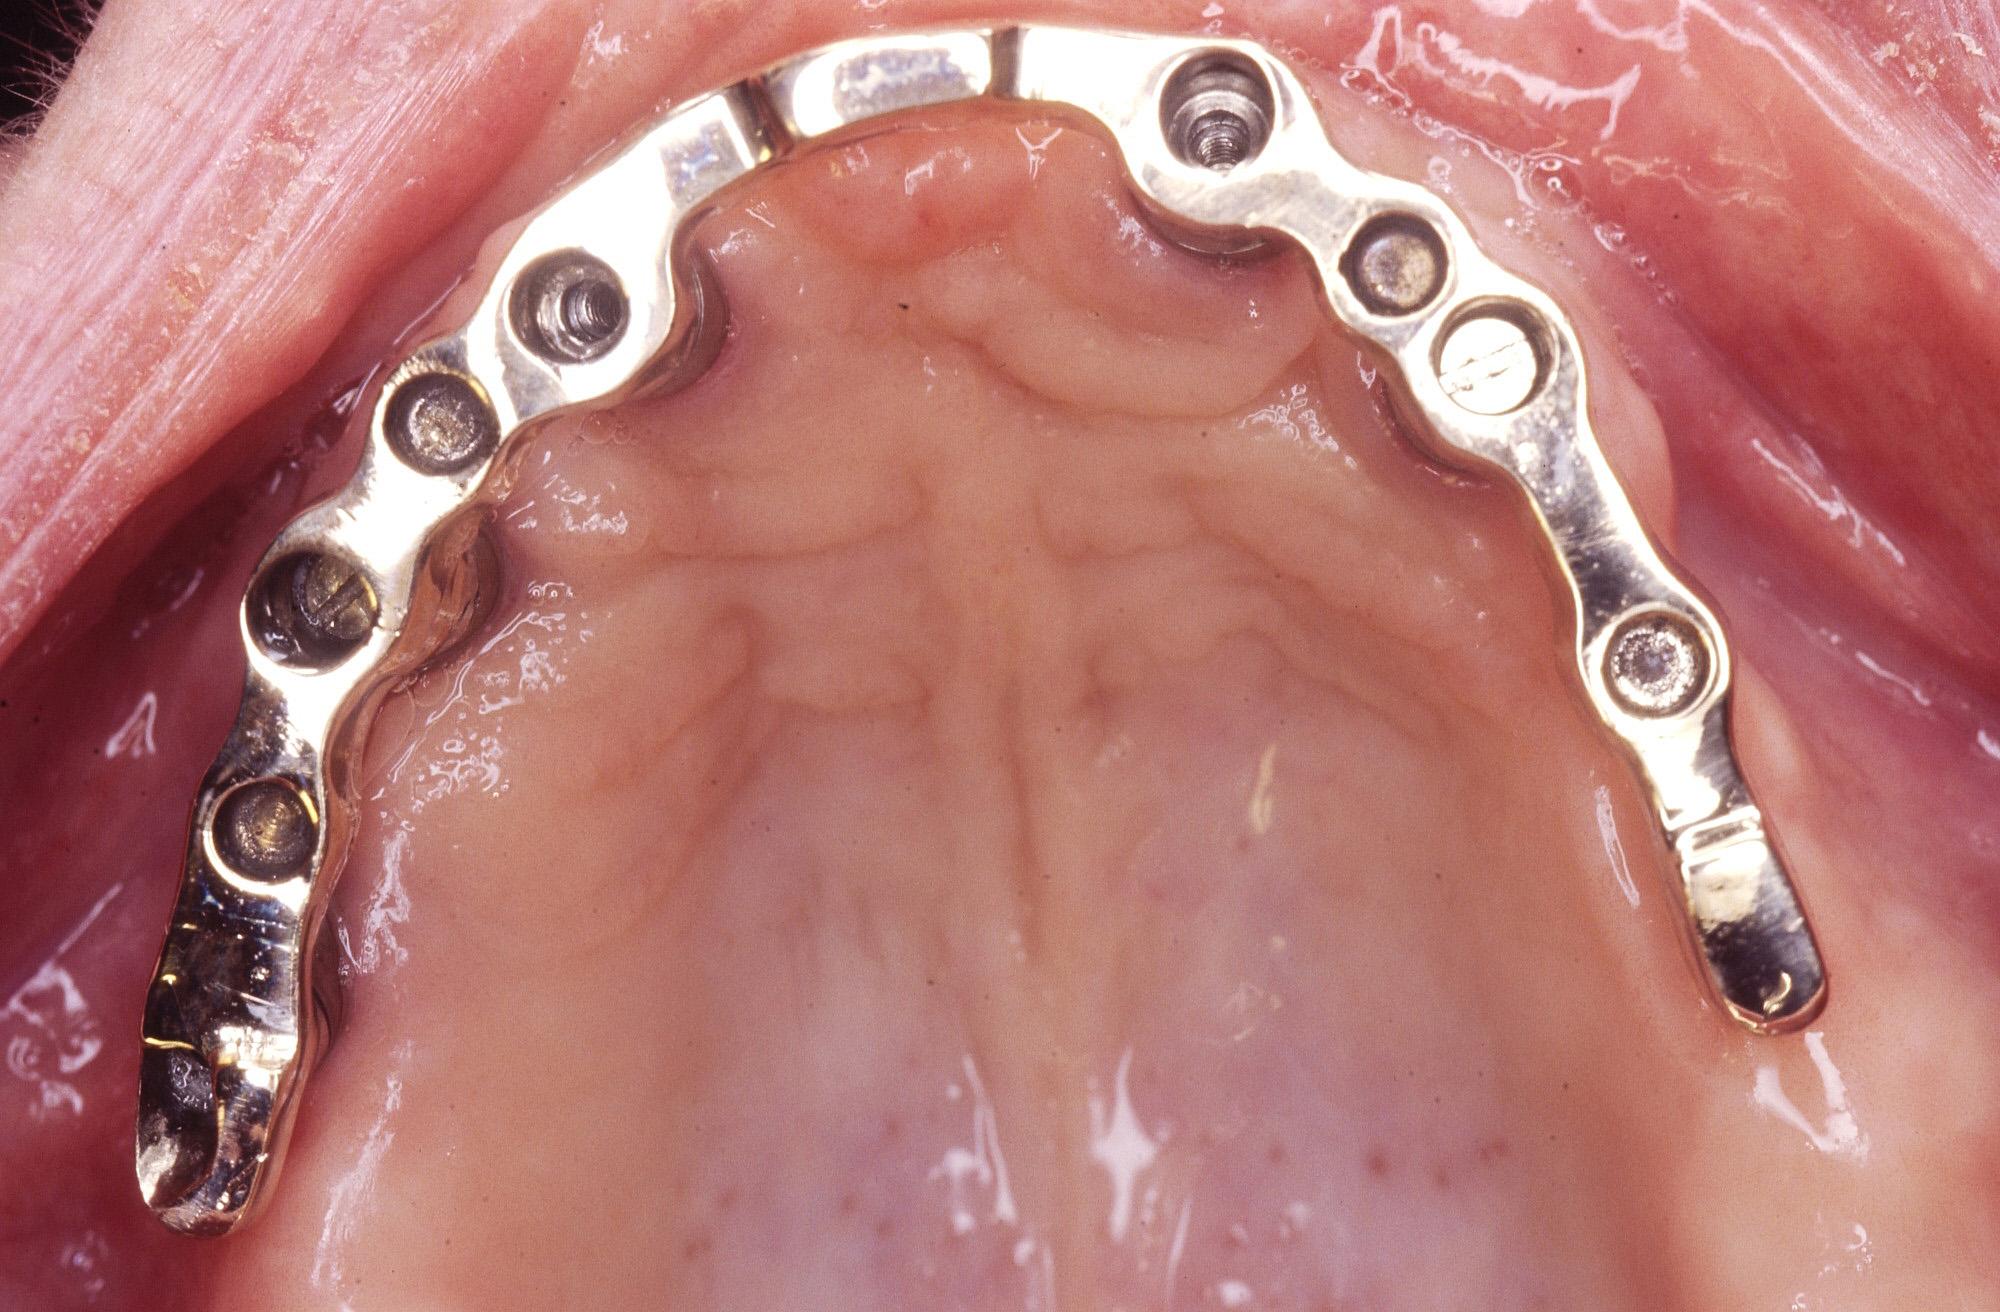 Implant Dentures Complete Northland Prosthodontics